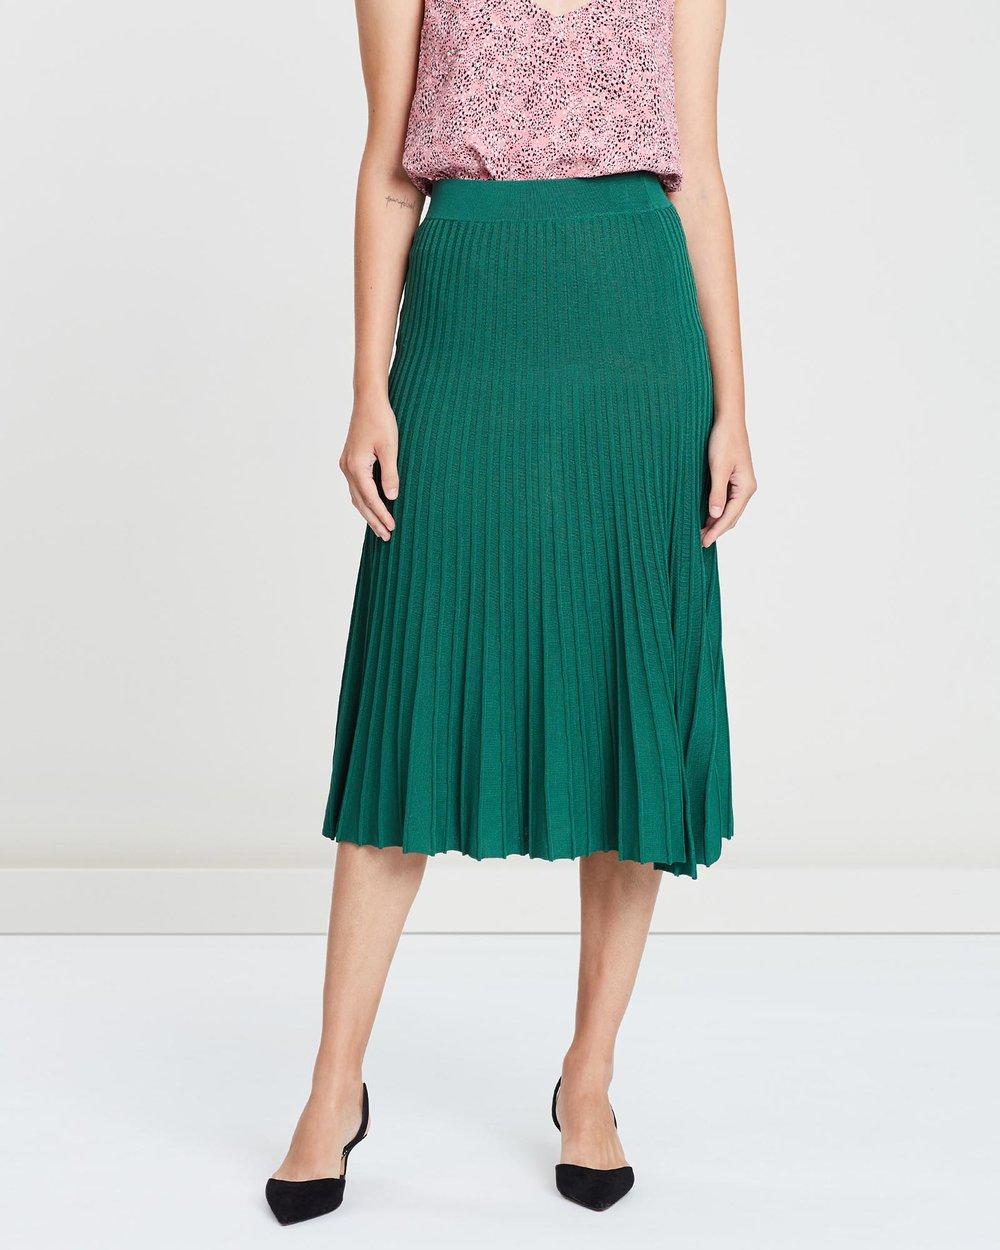 0894a4aca1 Ruby Rib Knit Skirt by SABA Online   THE ICONIC   Australia